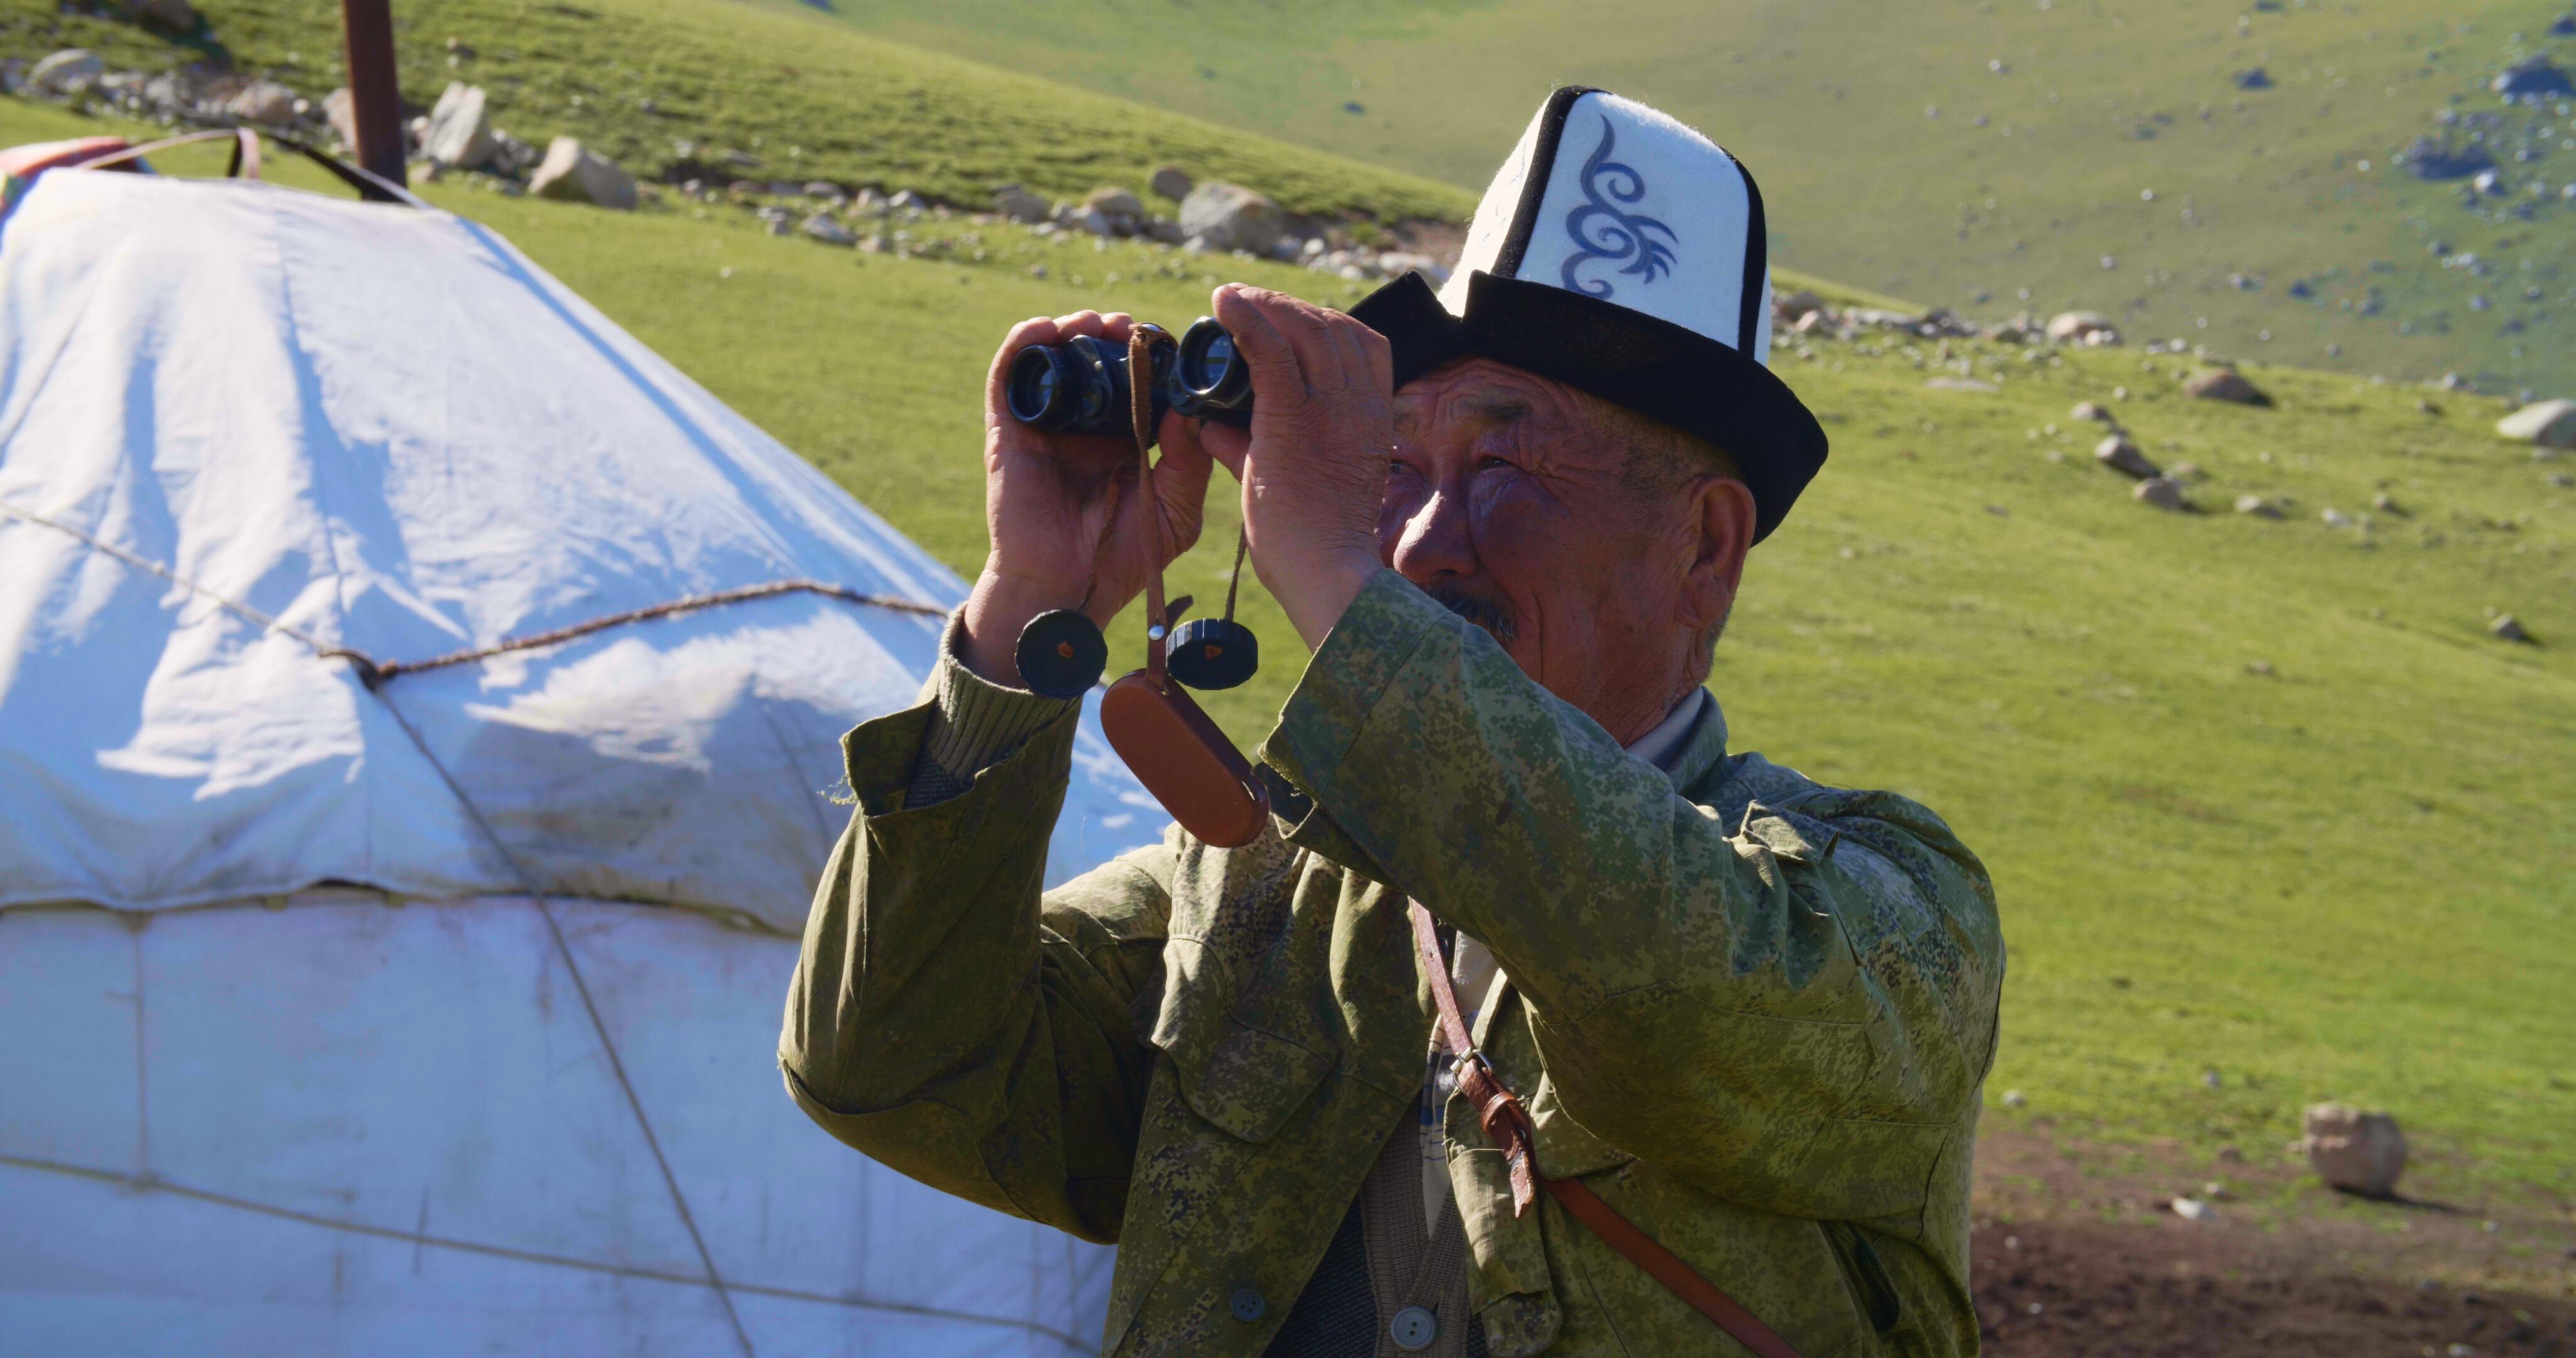 TheBoyFromKyrgyzstan_Stills_1.39.1